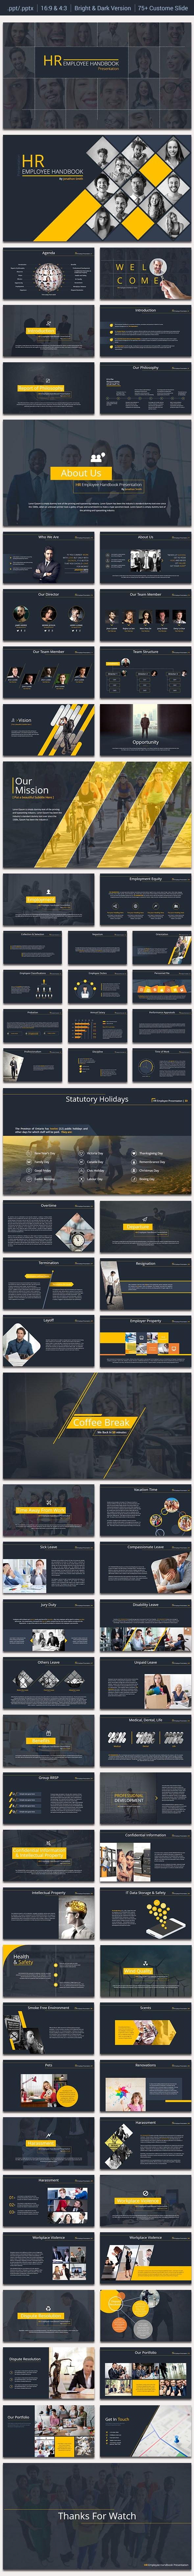 HR Employee Handbook Presentation - Business PowerPoint Templates